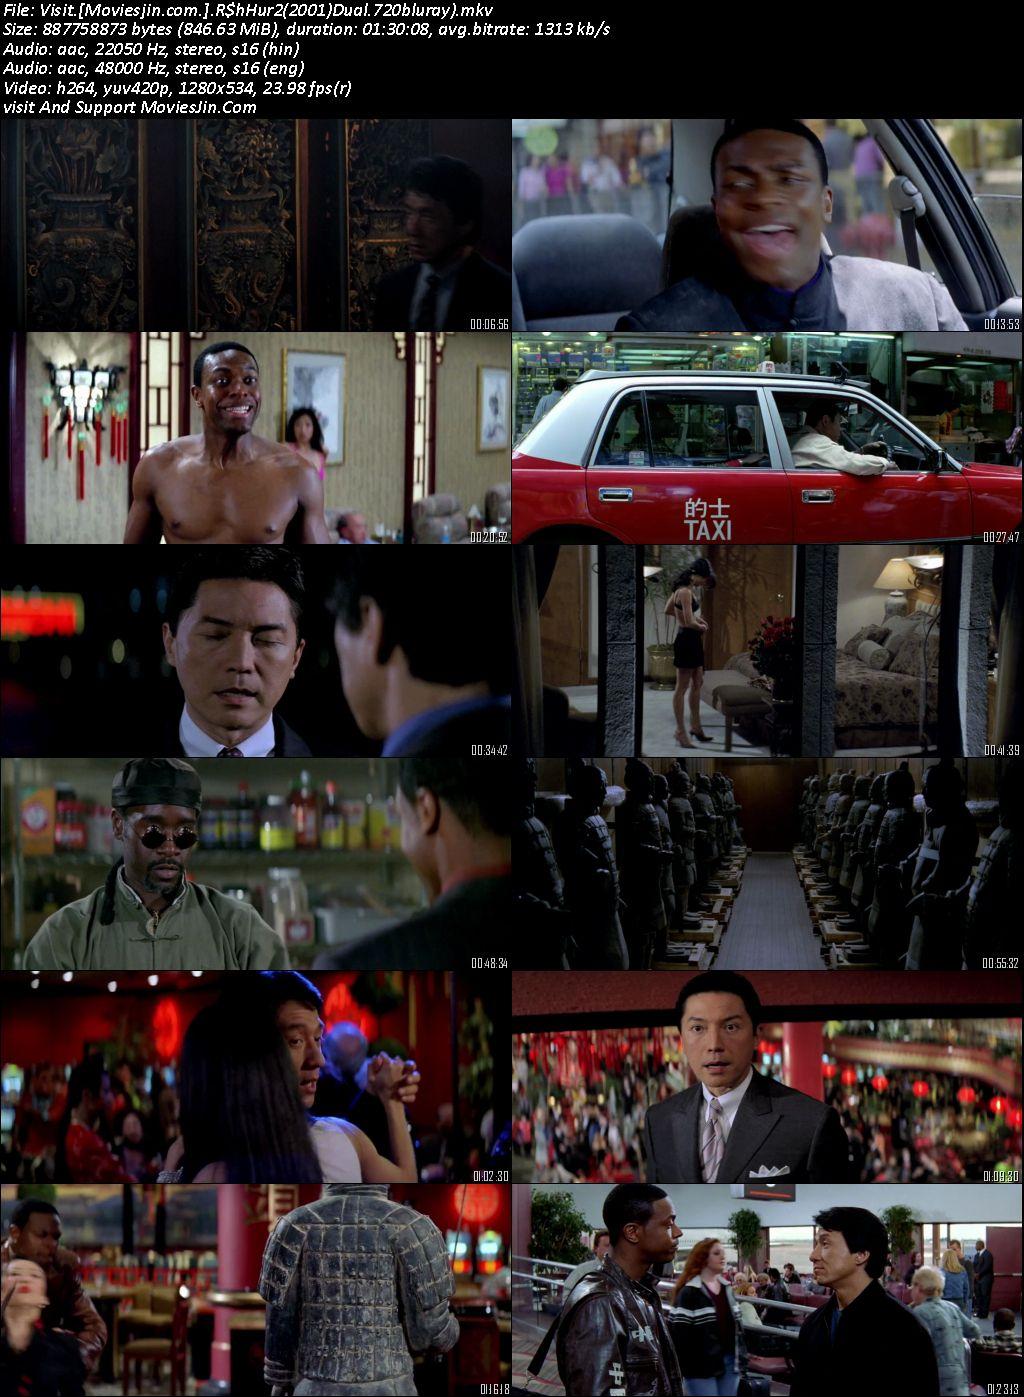 Rush Hour 2 2001 300MB Movie Dual Audio Esubs 480p BluRay